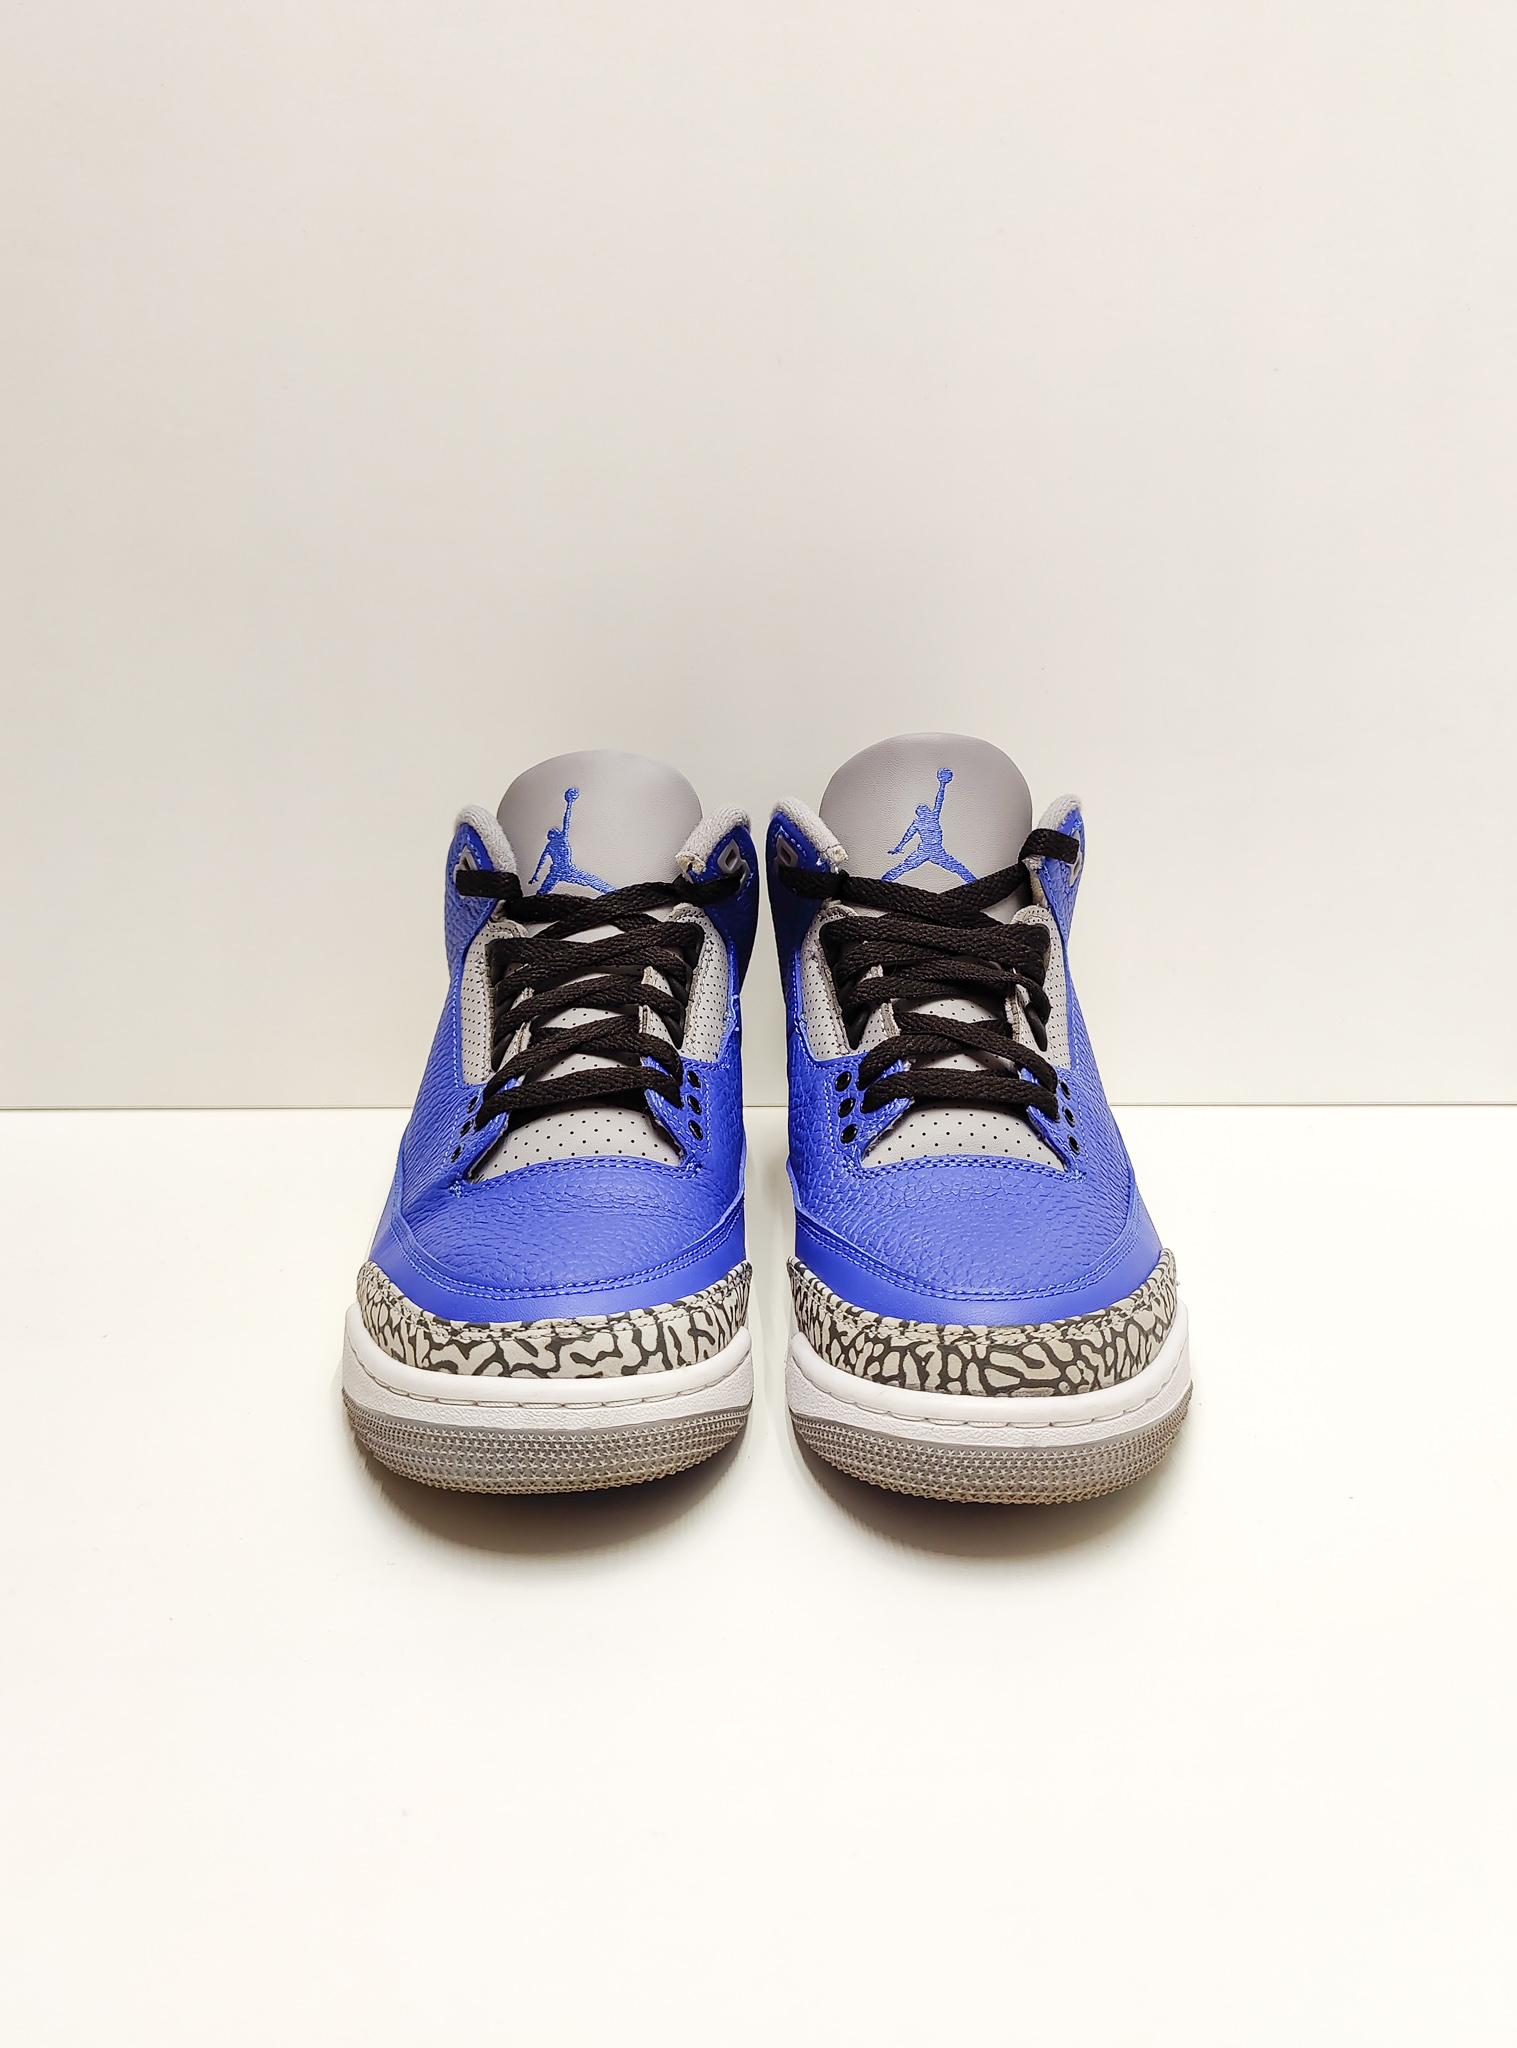 Jordan 3 Retro Varsity Royal Cement